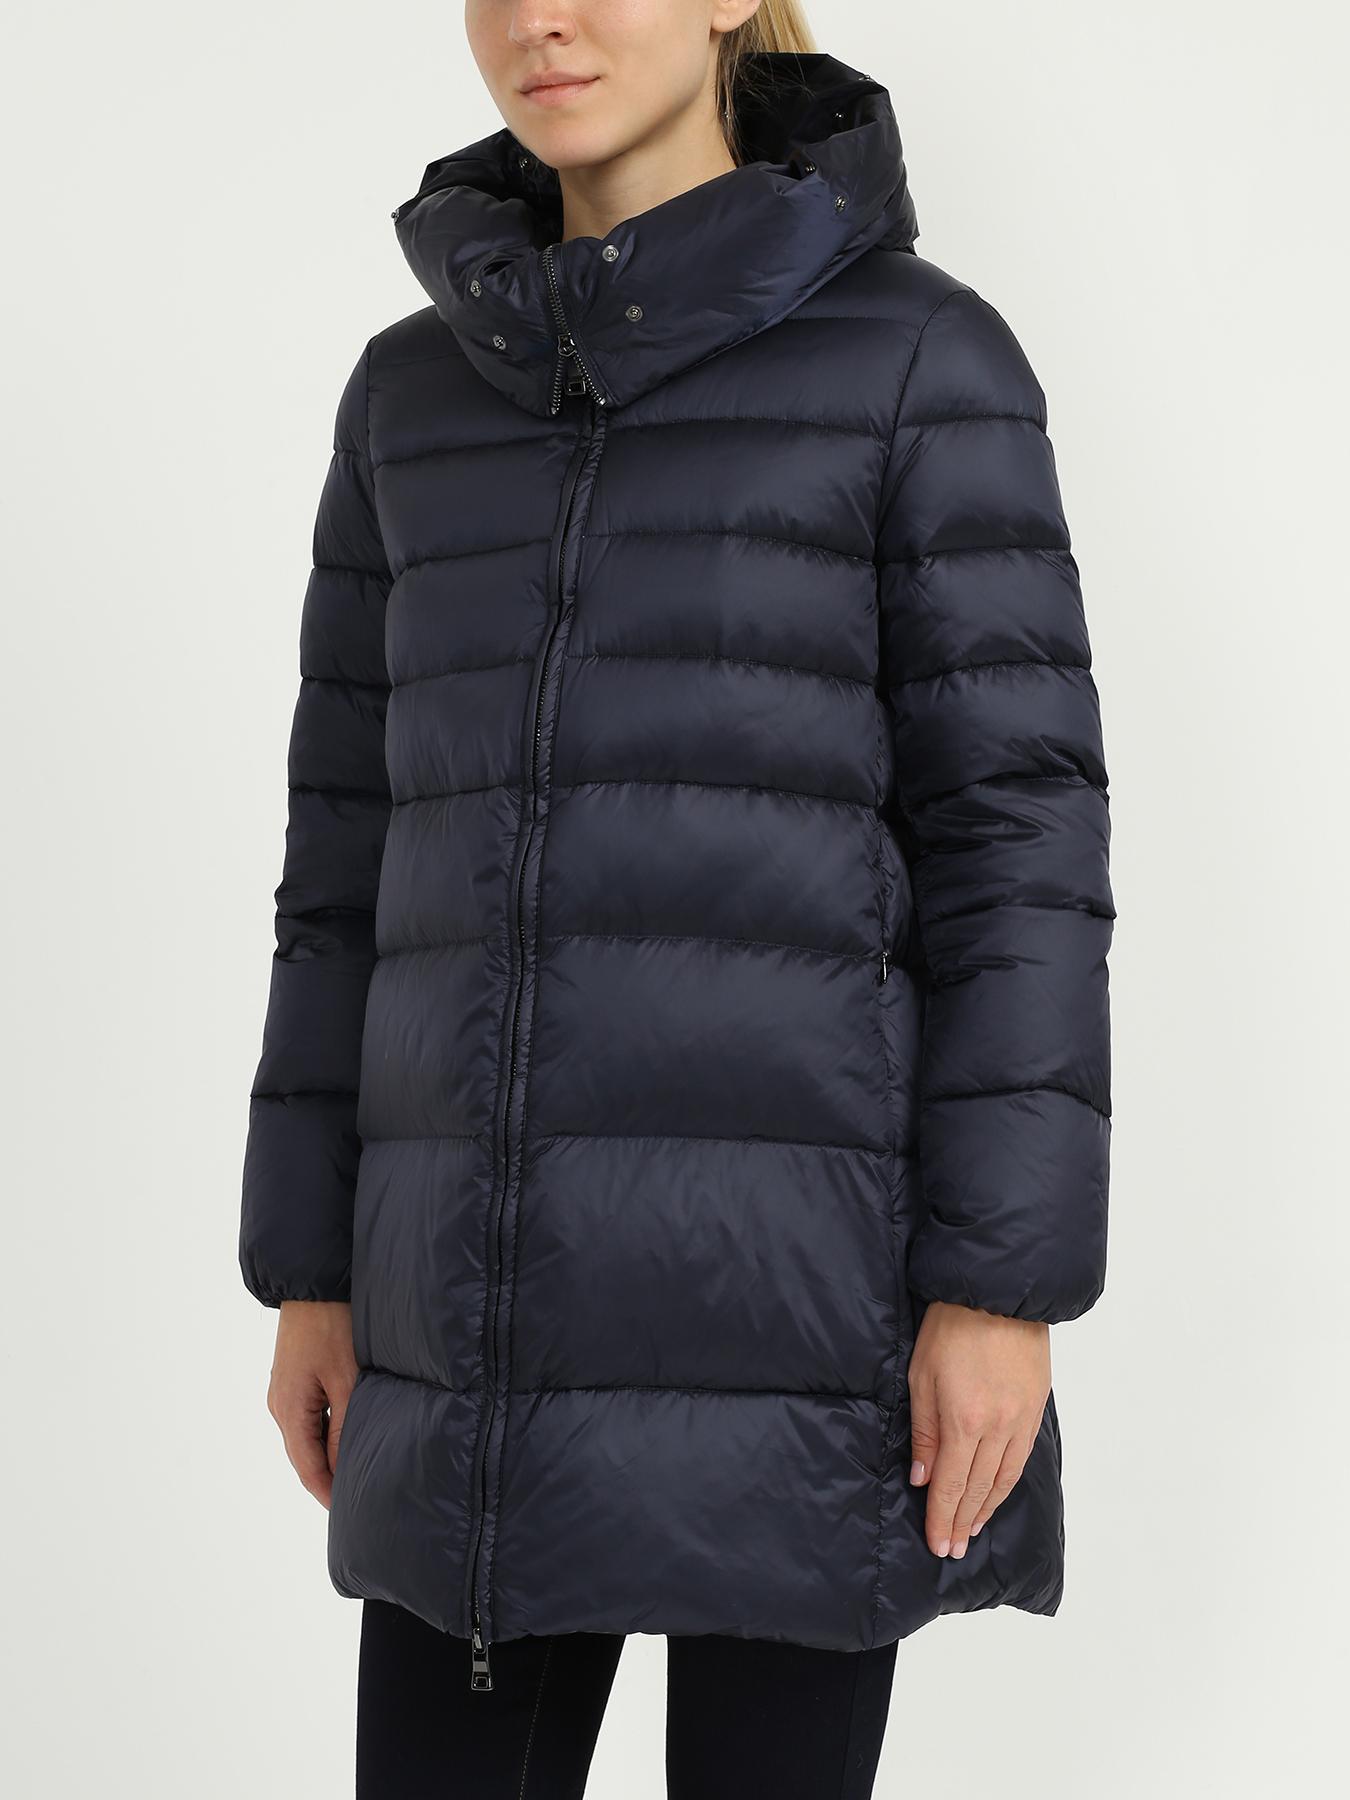 ORSA ORSA Нейлоновая куртка